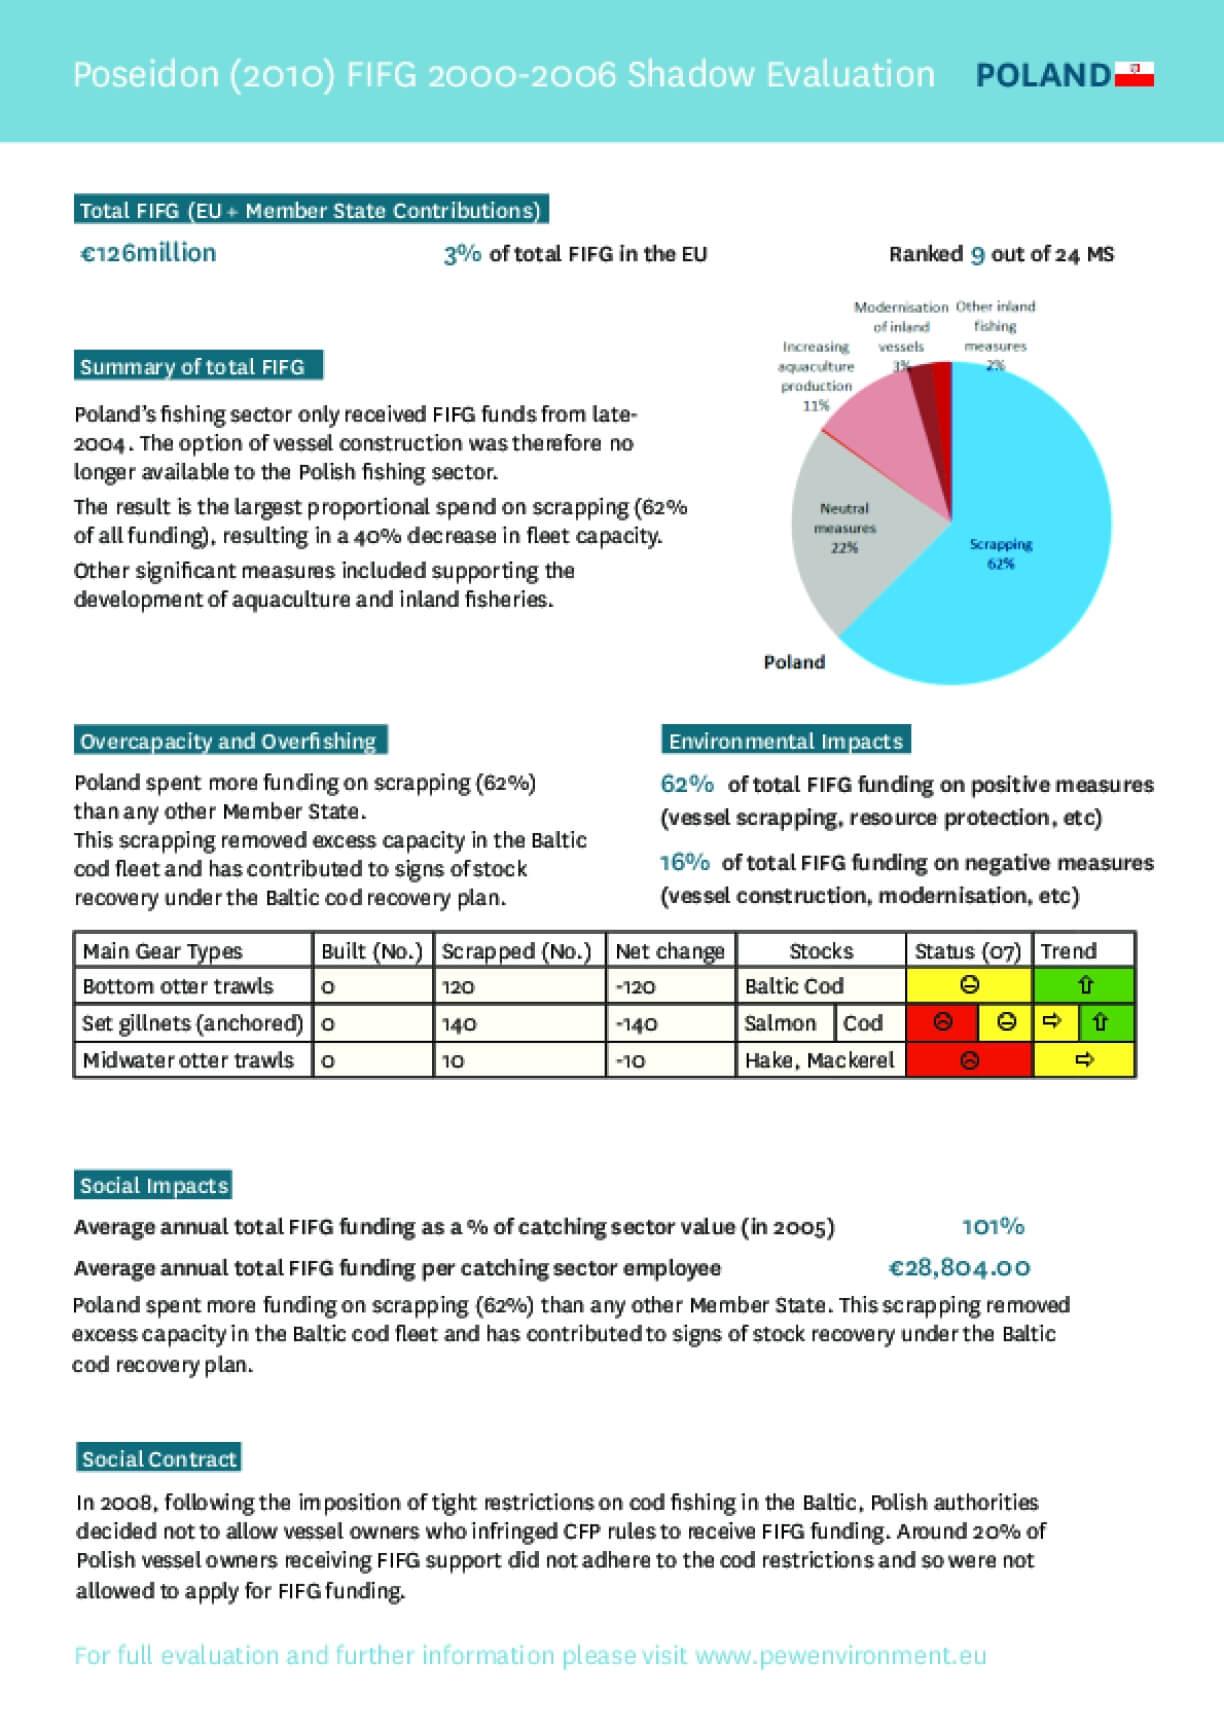 FIFG 2000-2006 Shadow Evaluation - Poland